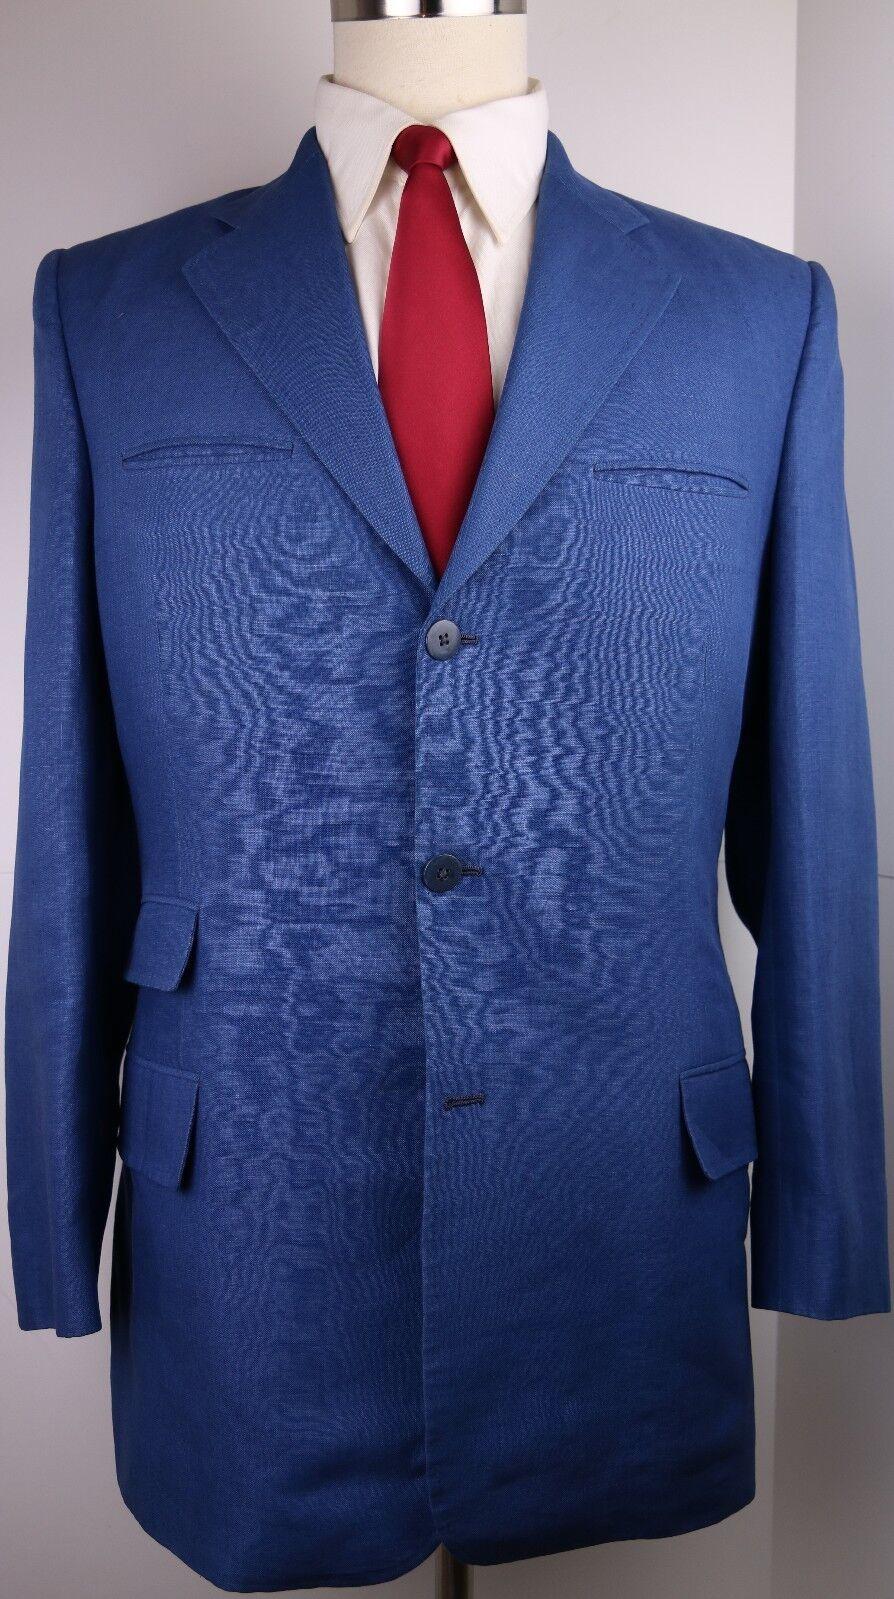 Nino Corvato Bespoke Blau Linen Three Button Side Vented Suit 40 L 33 32 Pants